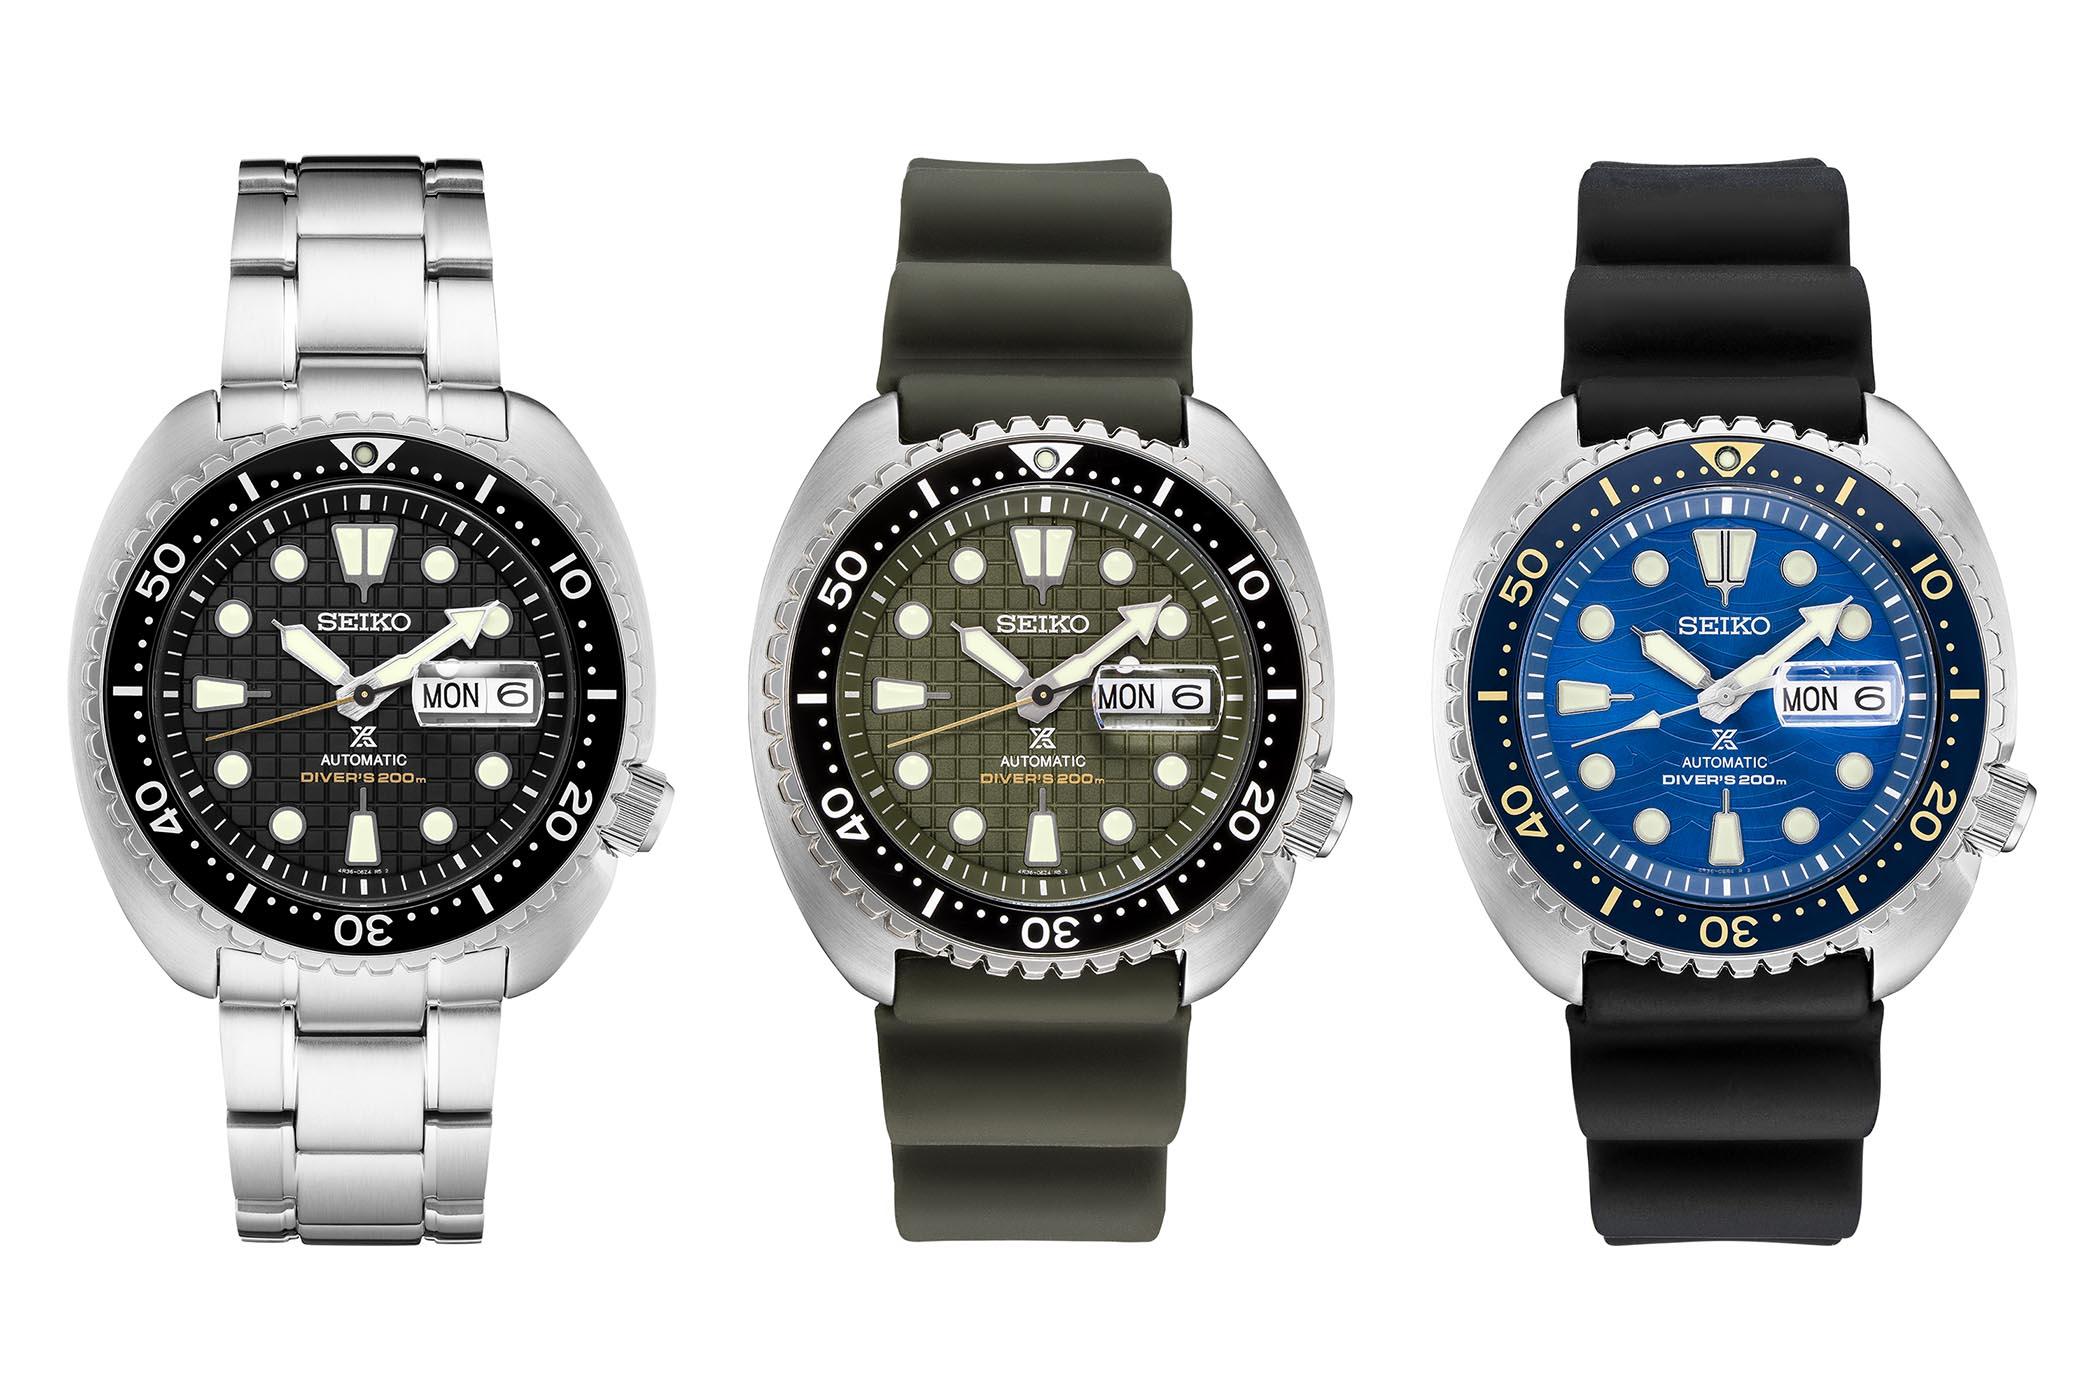 Seiko Prospex Automatic Diver 200m - Seiko King Turtle SRPE03 SRPE05 SRPE07